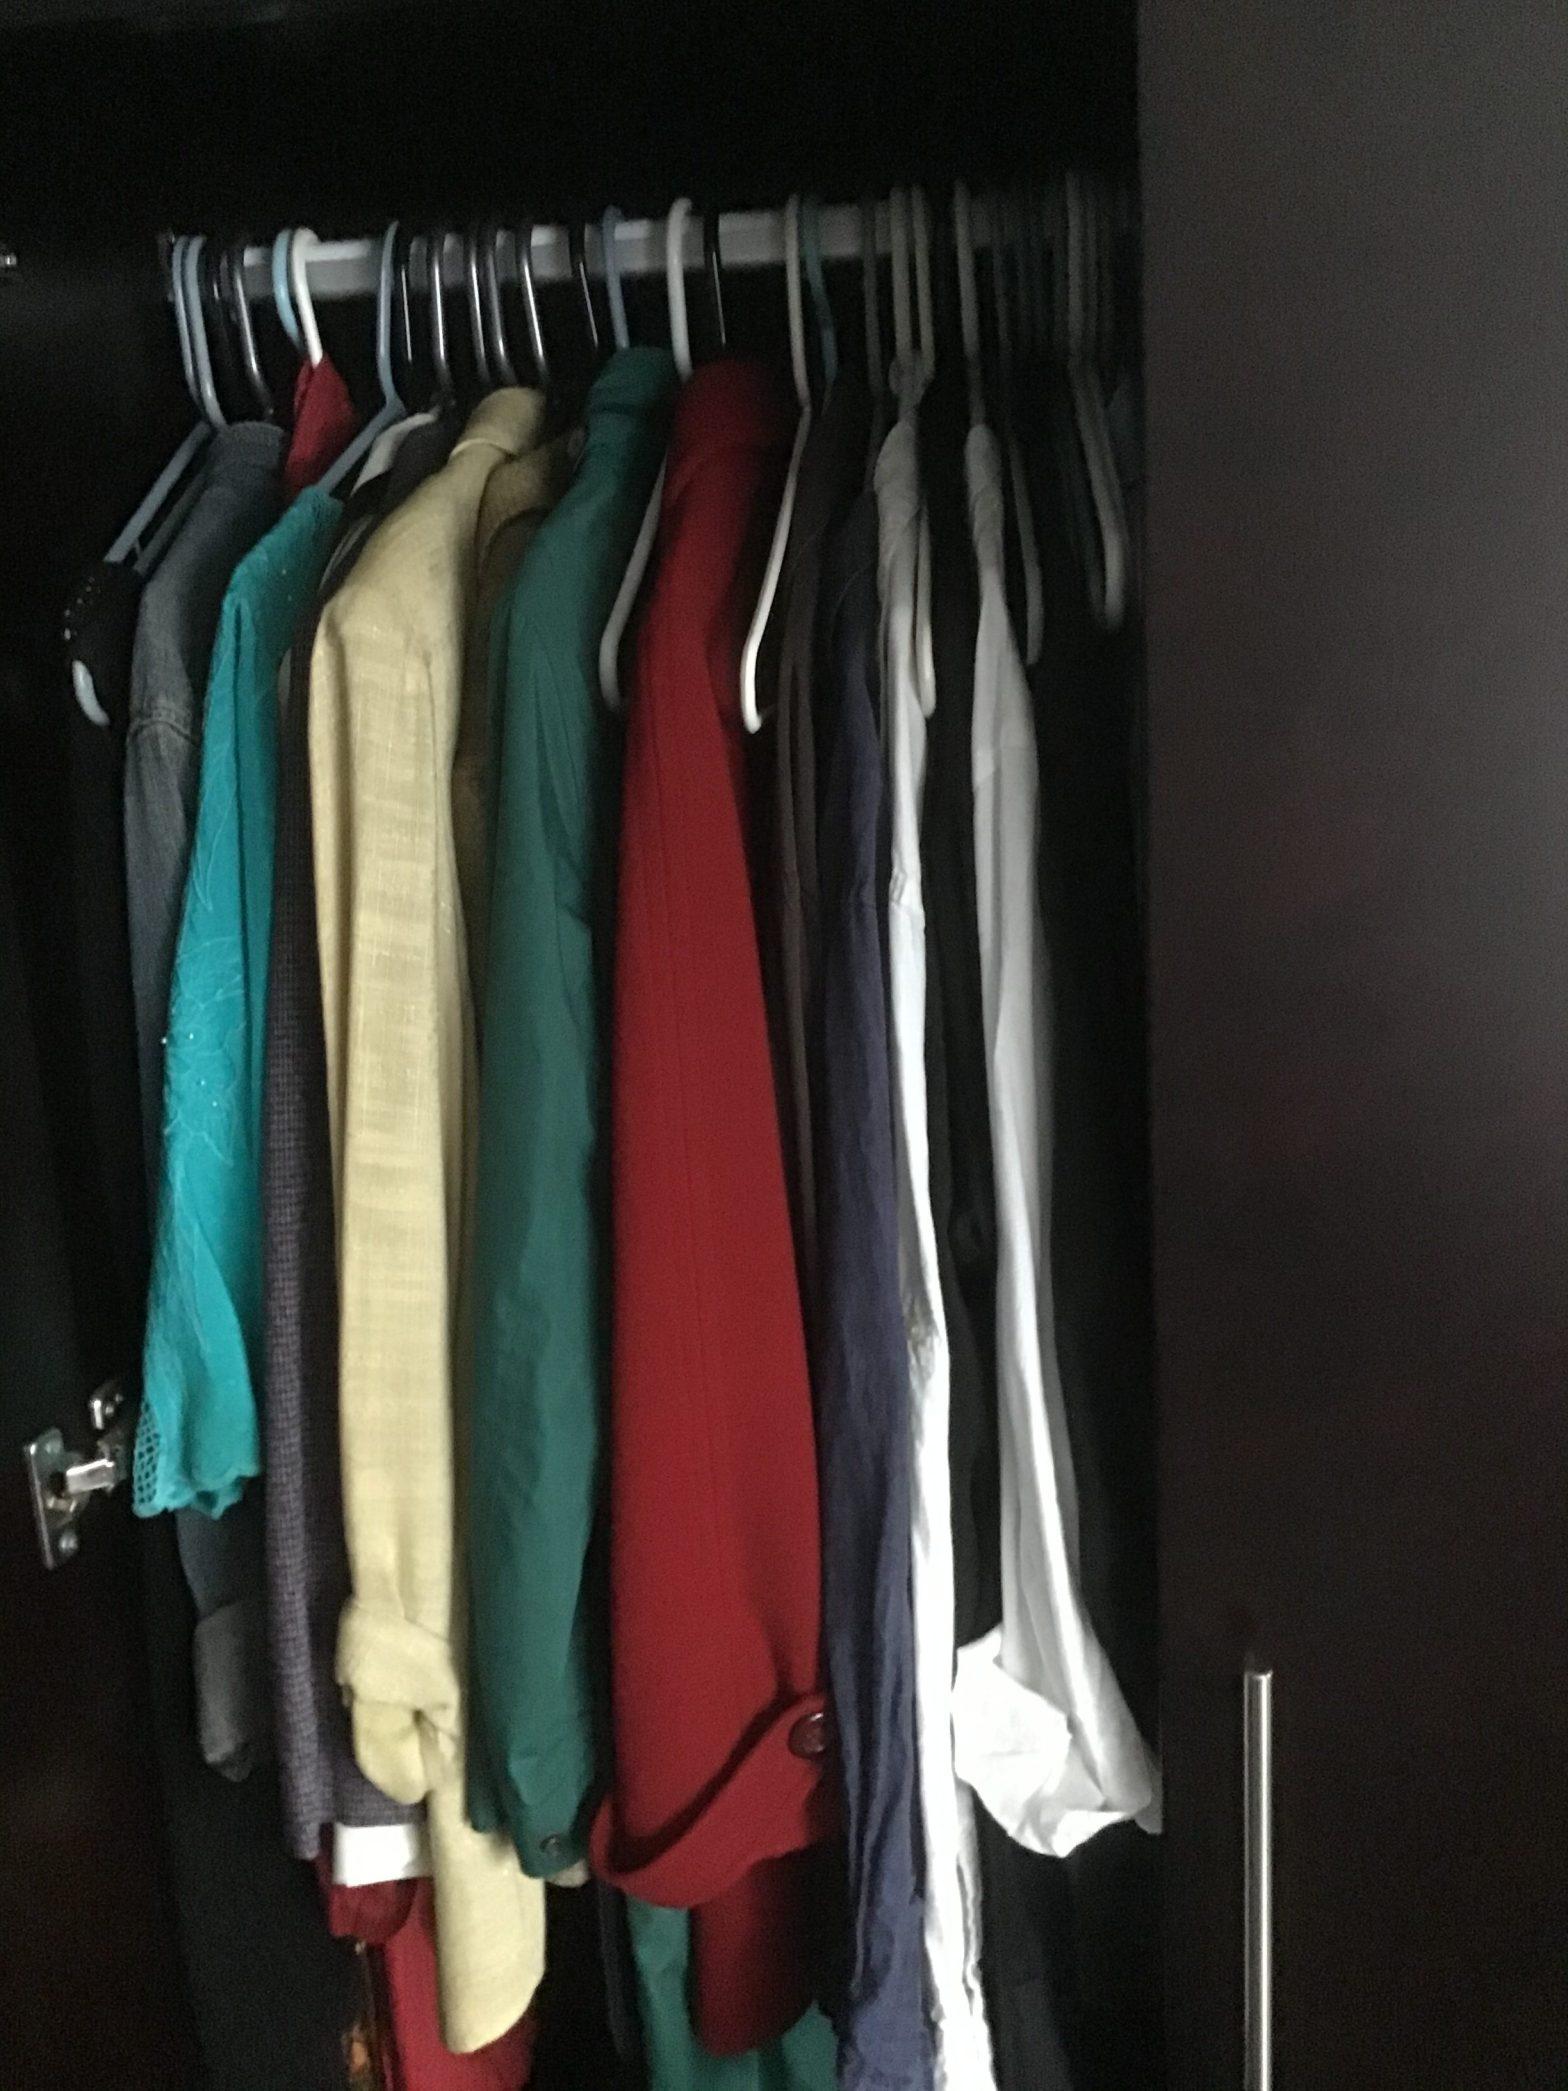 Closet as she left it